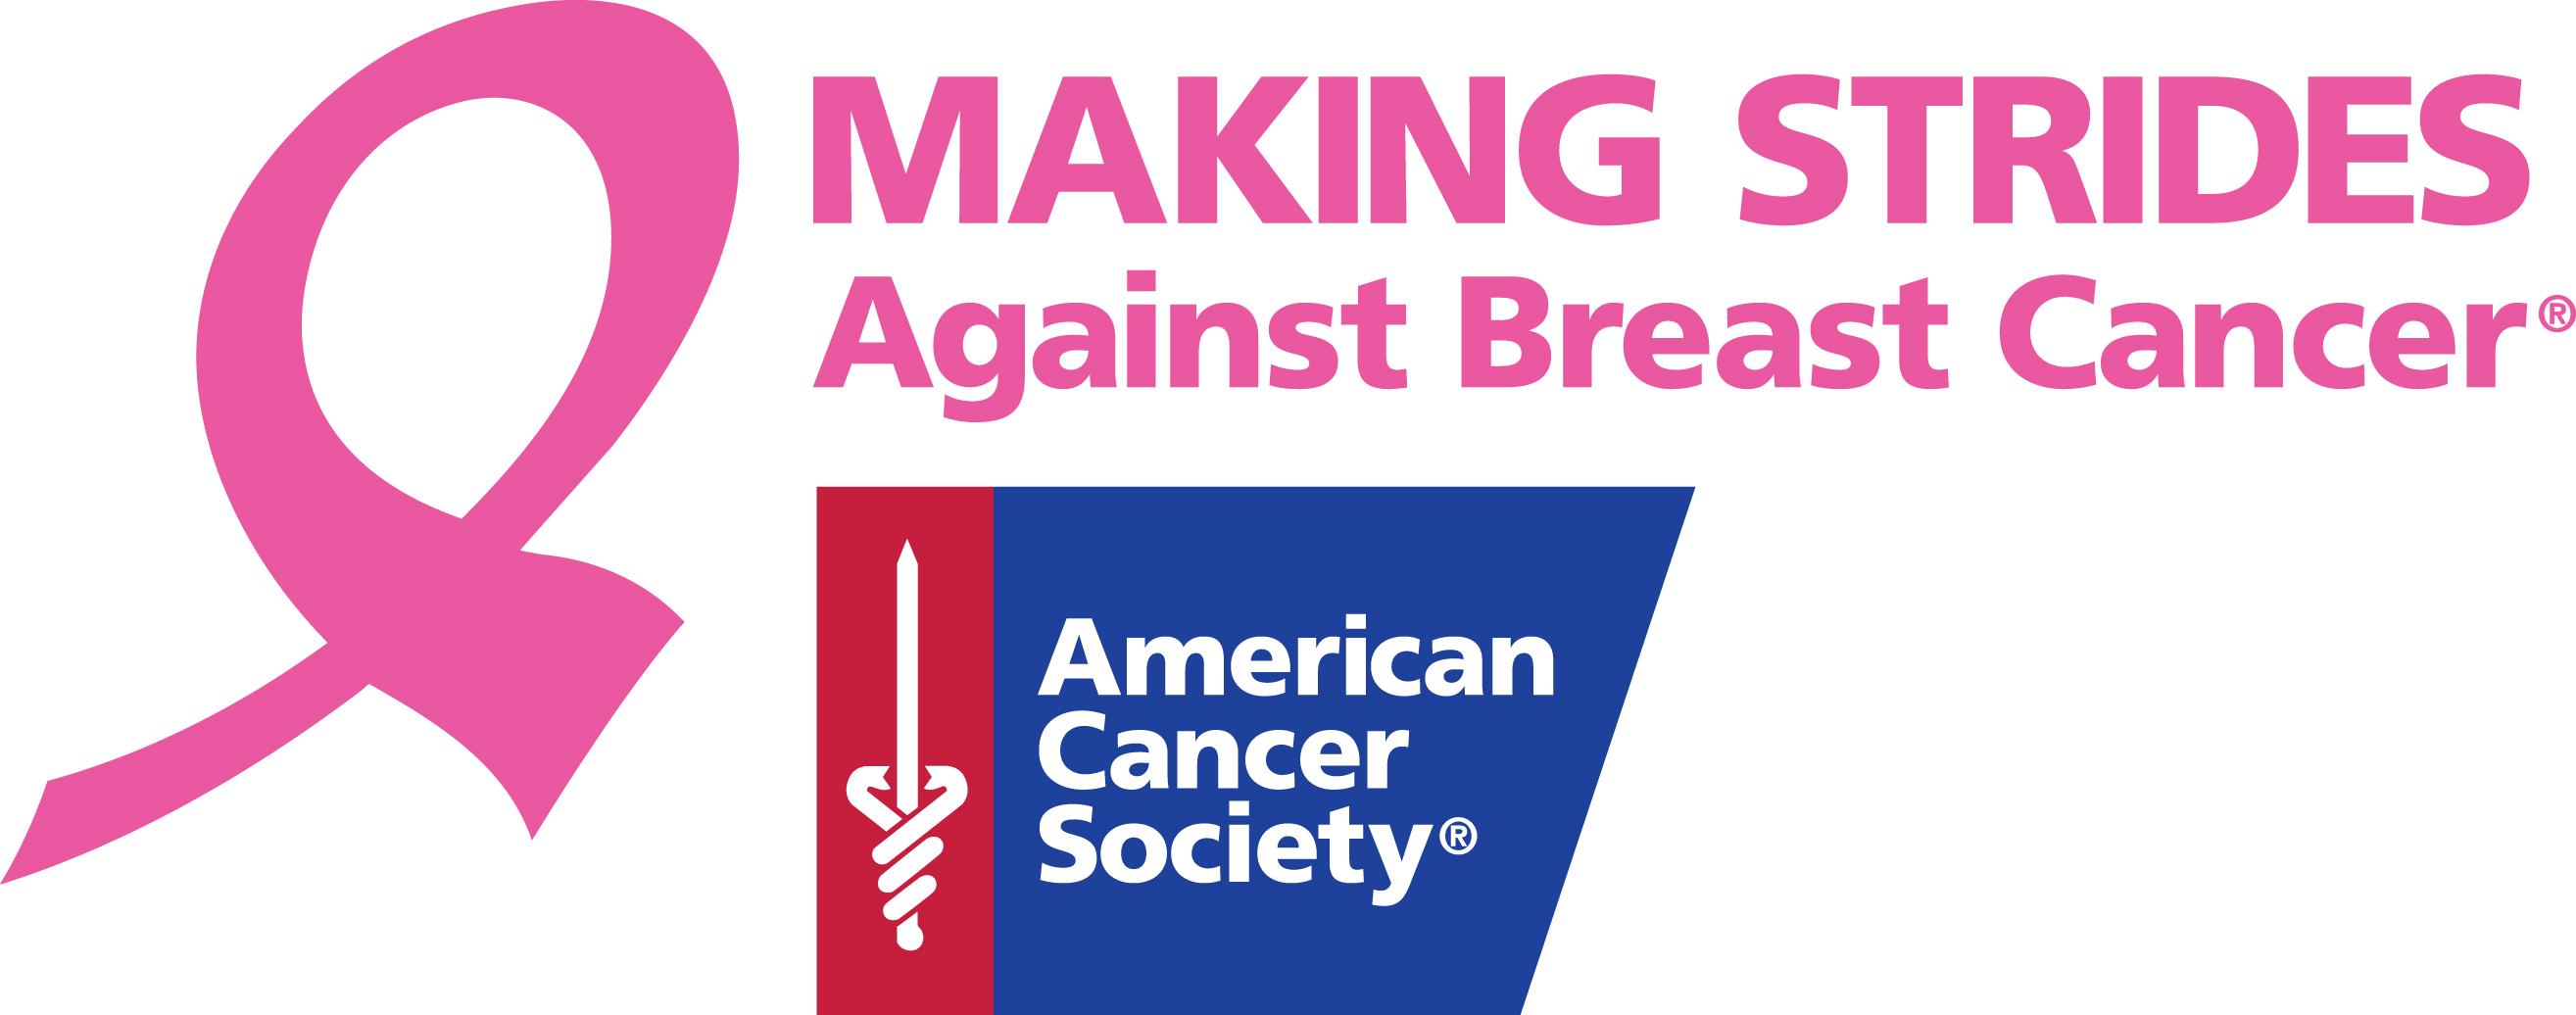 breast cancer society car donation jpg 422x640